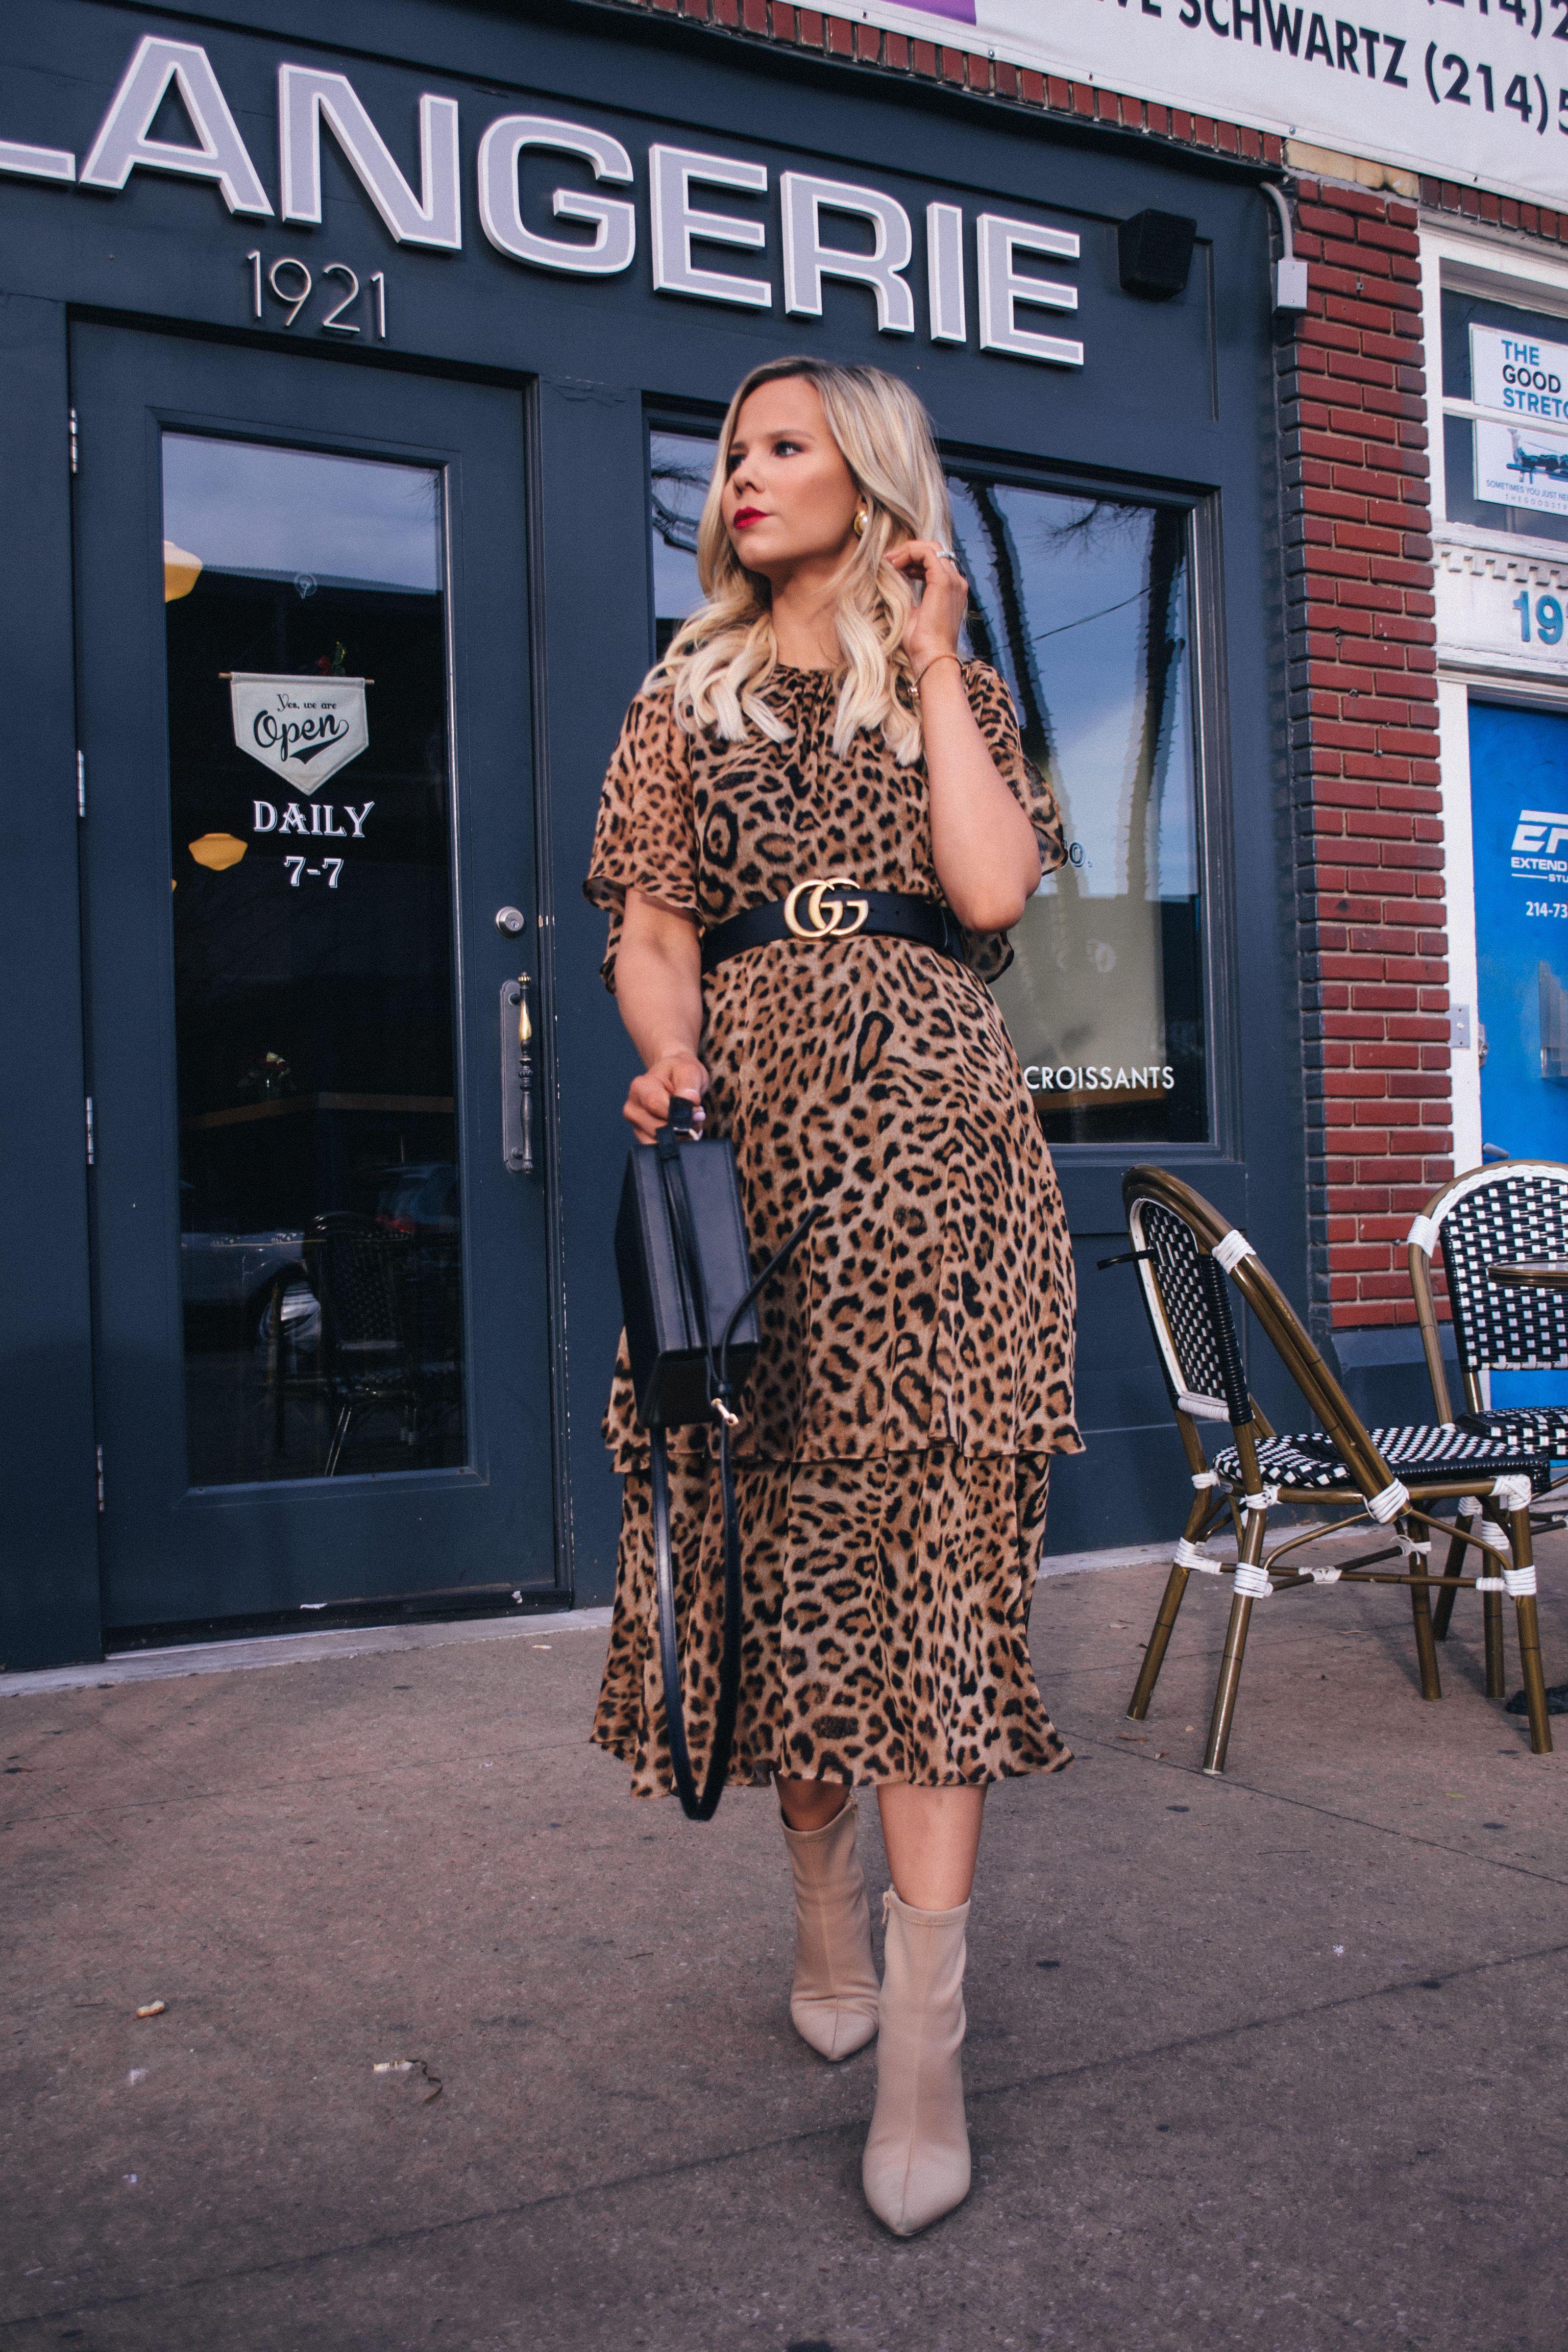 1417419349c0 Leopard dress with Gucci Belt, dallas blogger, leopard fashion, leopard  style #leopard #fashion #blogger